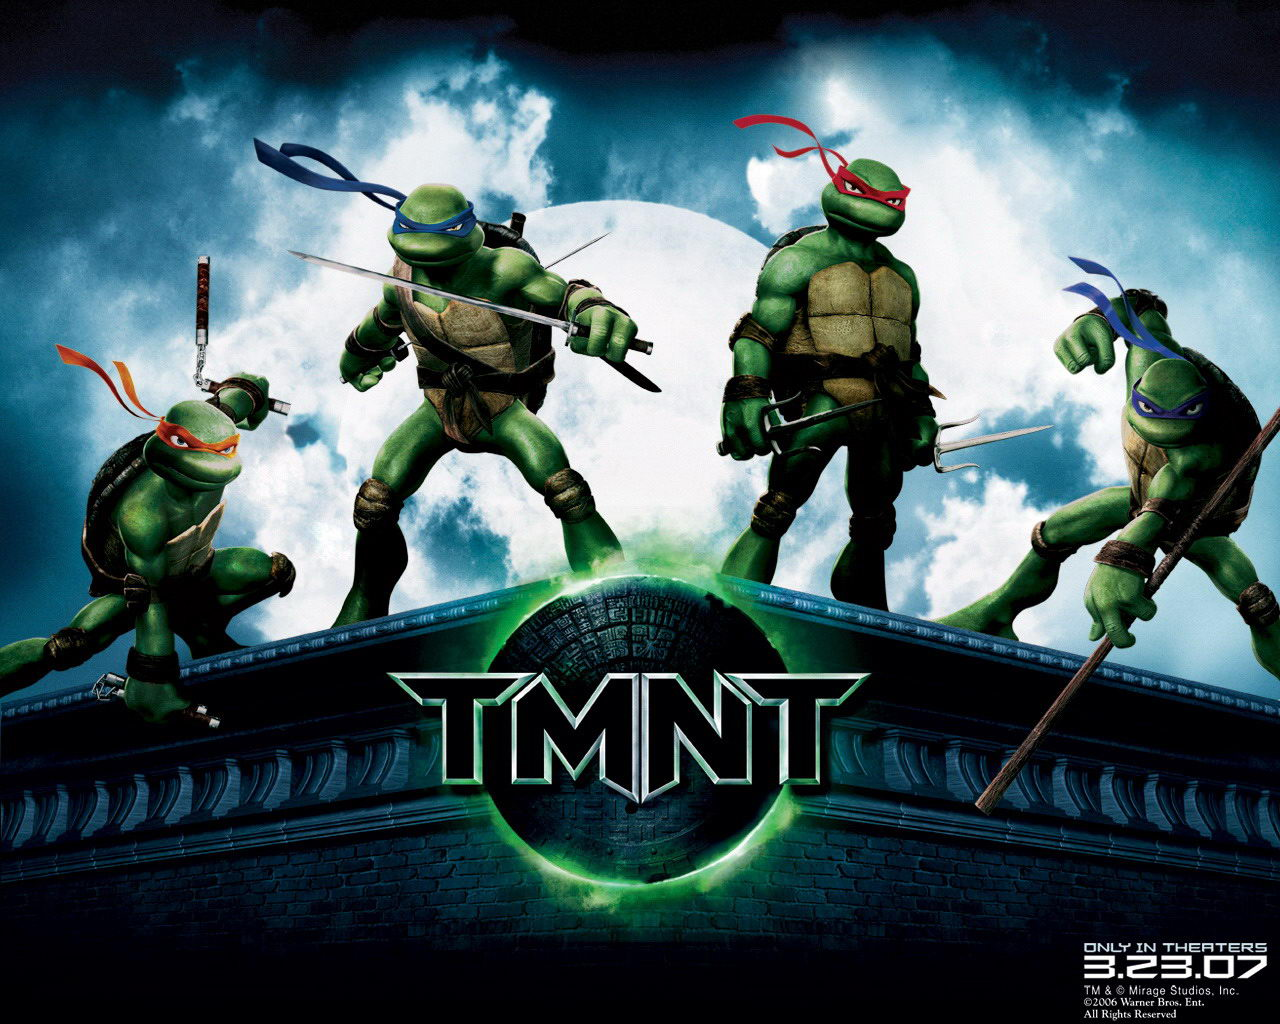 http://1.bp.blogspot.com/-TI96ptopU7o/TscbtOTPLlI/AAAAAAAAA7I/14KTrM3a2WA/s1600/a1-ninja-turtles-wallpaper-1-704238.jpg